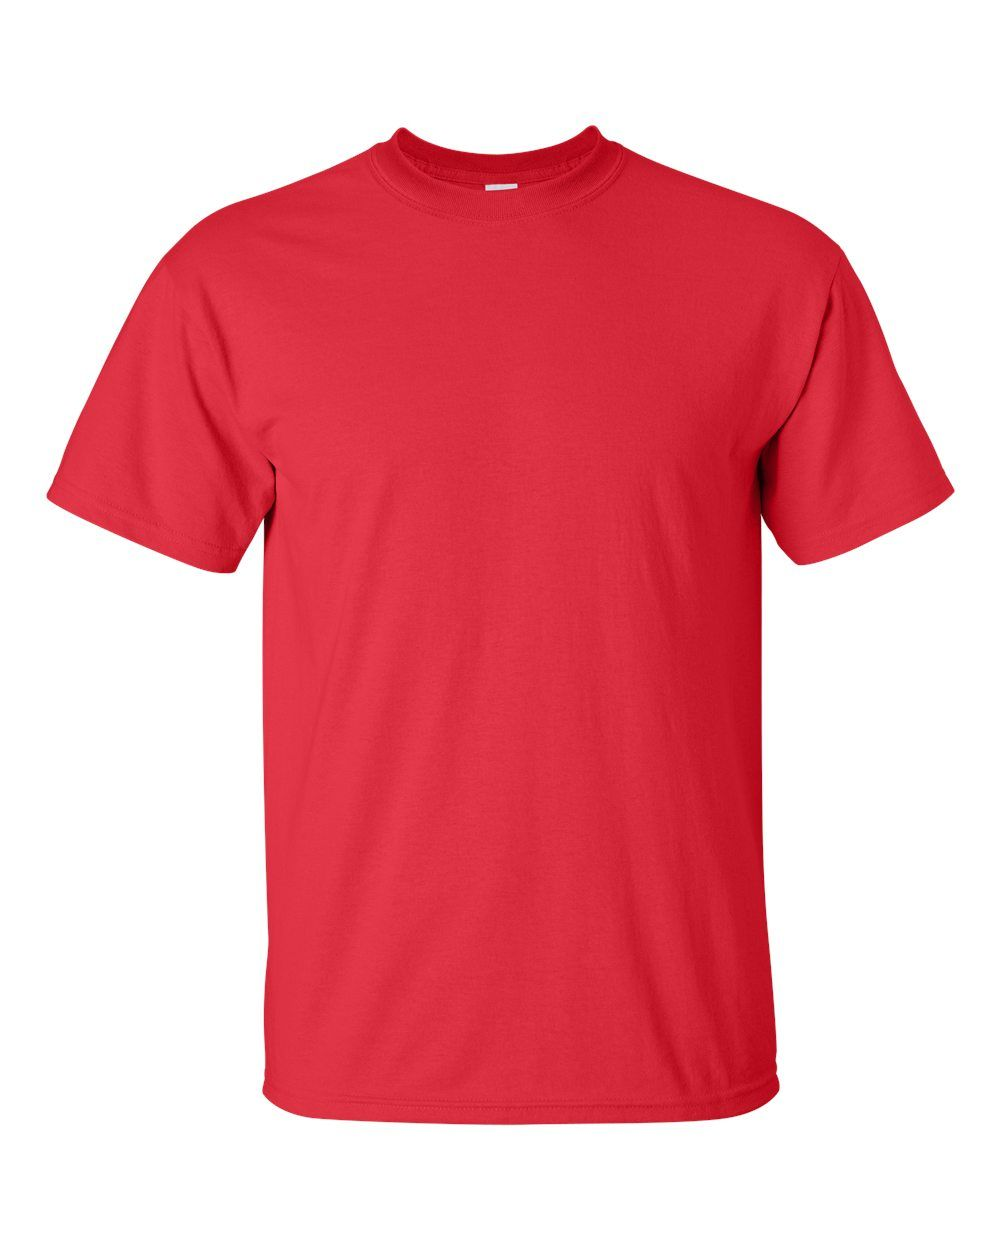 Gildan Ultra Cotton T Shirt 2000 Shirts Wholesale Shirts Cotton Tshirt